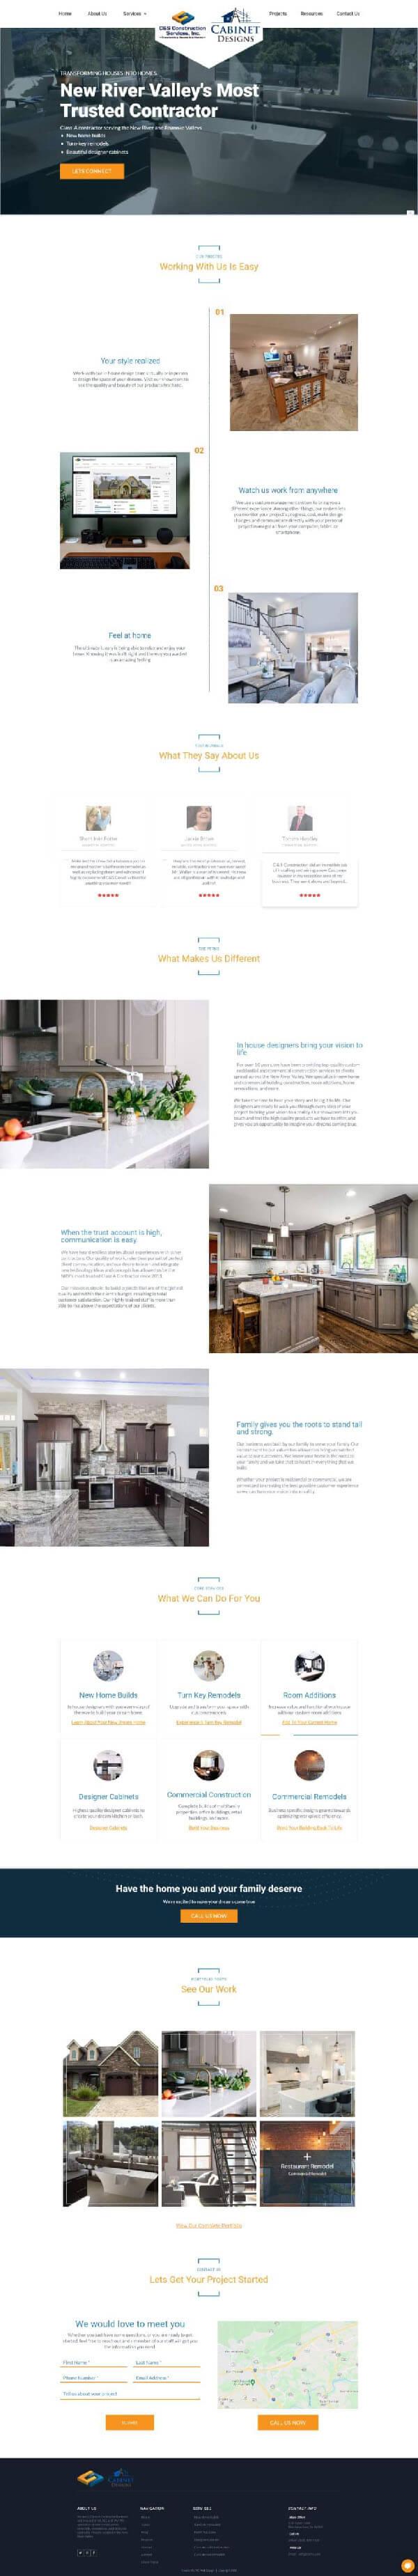 Construction company website designed by TJG Web Design